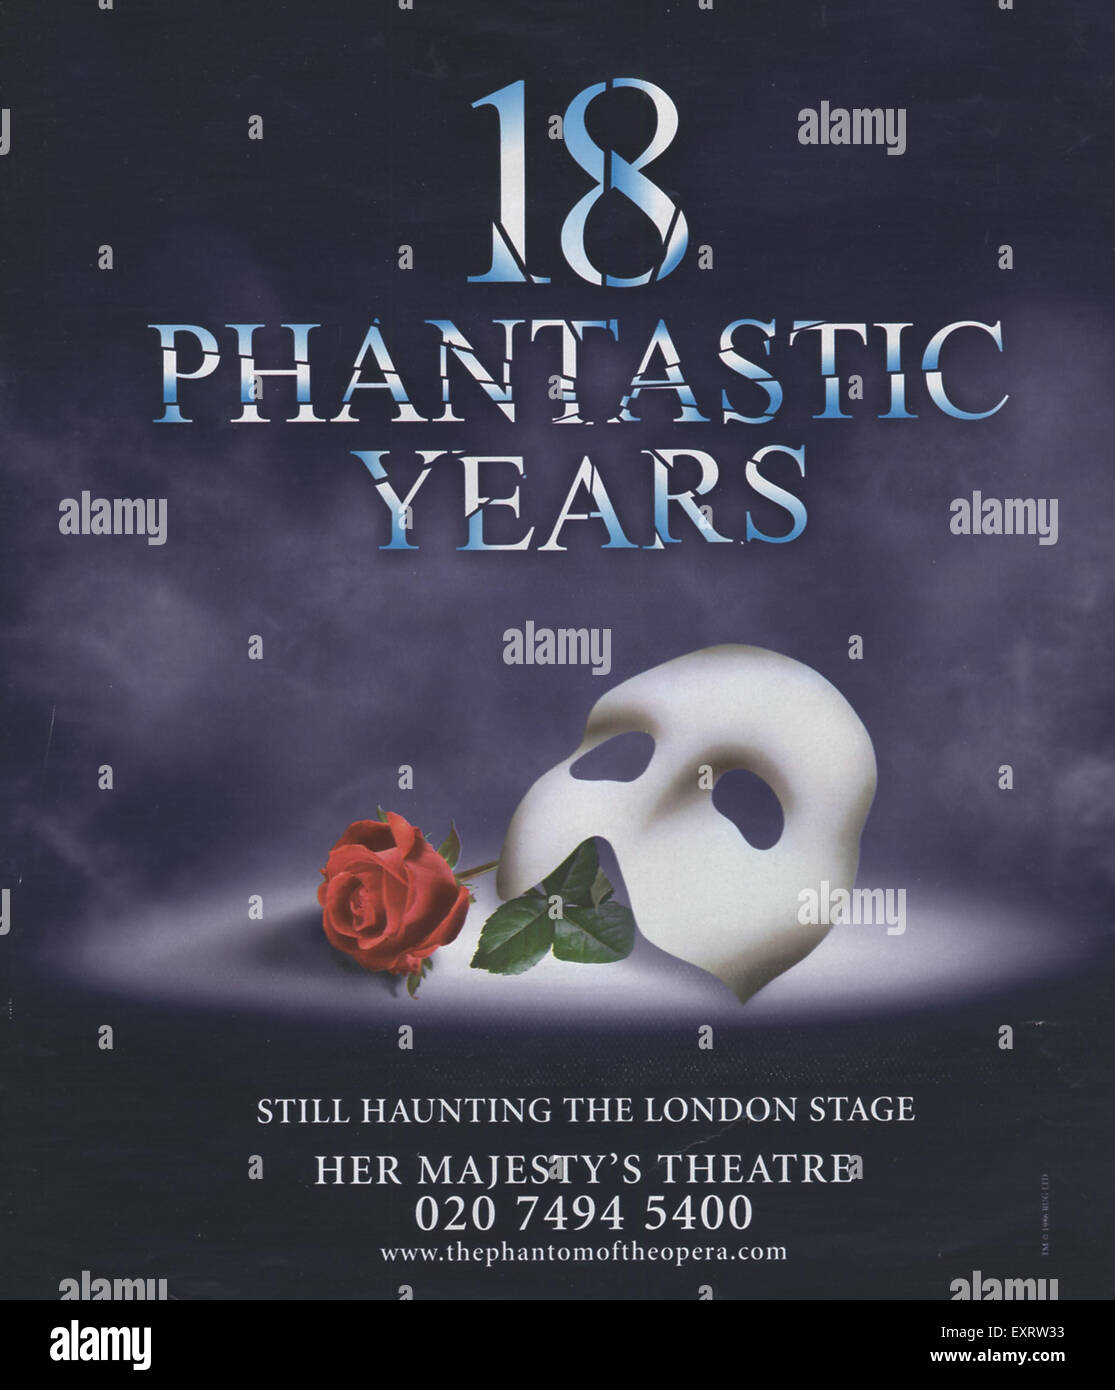 2000s UK Phantom Of The Opera Magazine Advert - Stock Image